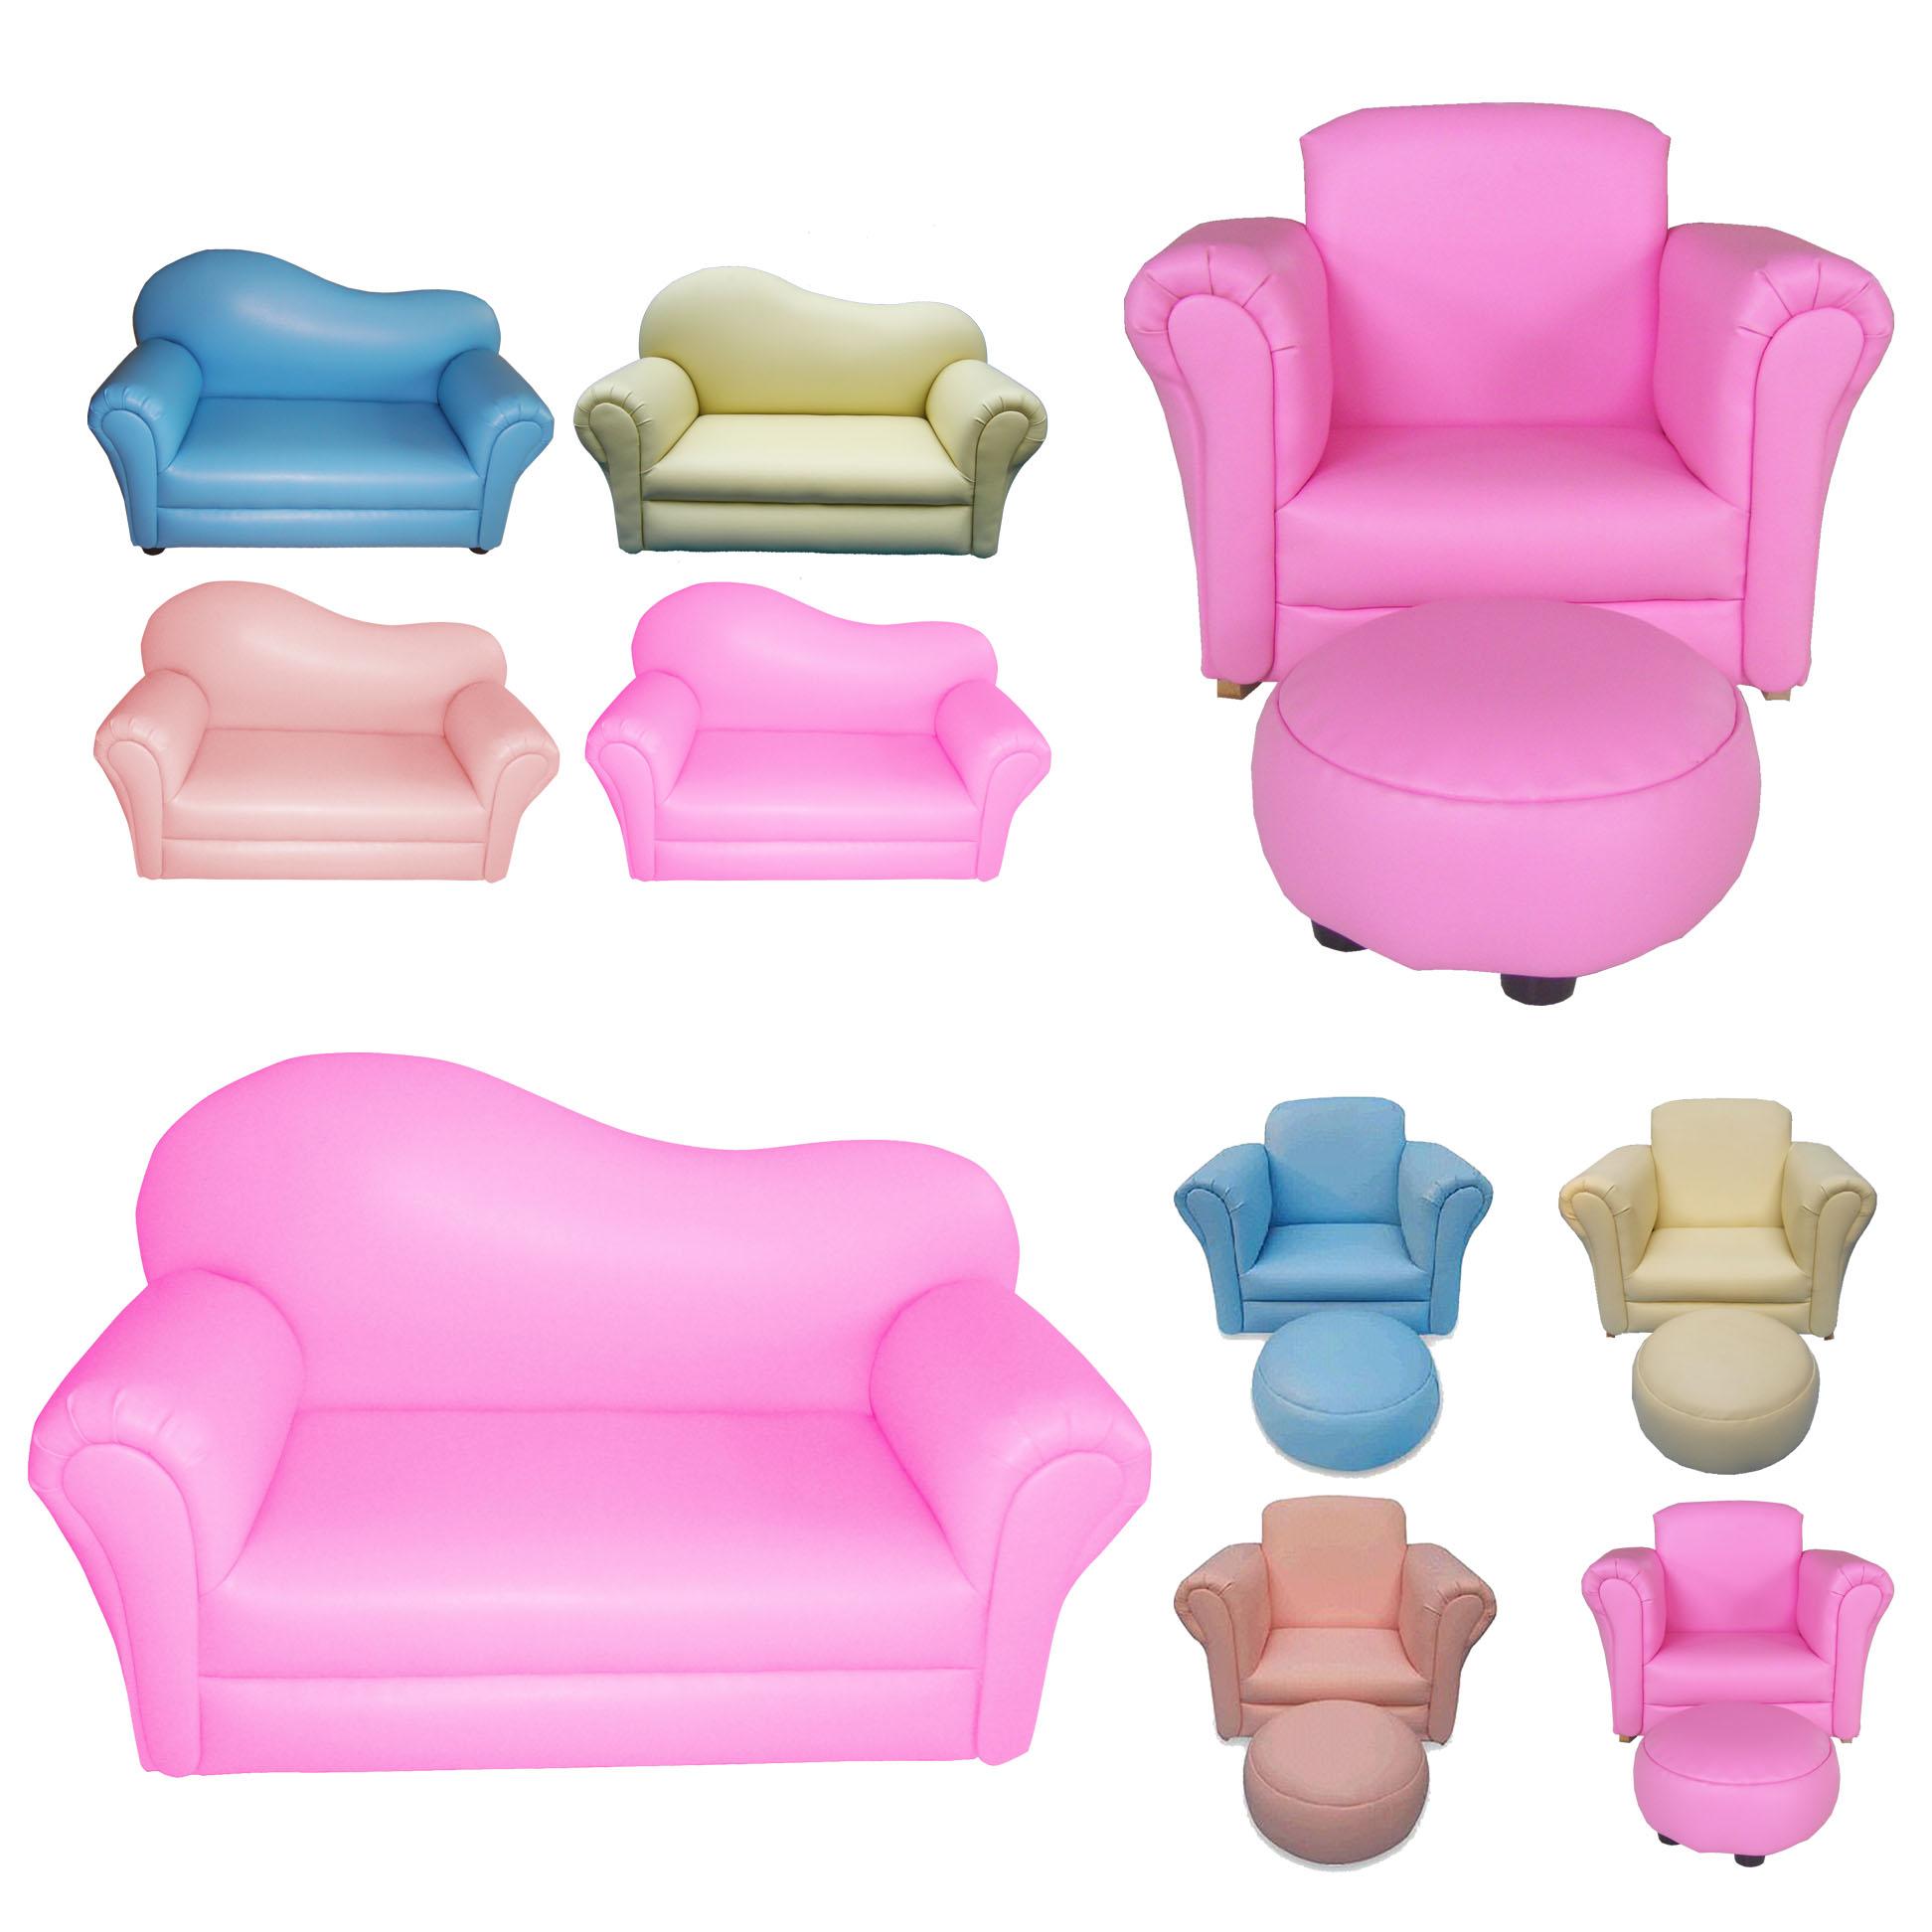 Children Kids Child Sofa Furniture Armchair Couch Seat On Chair